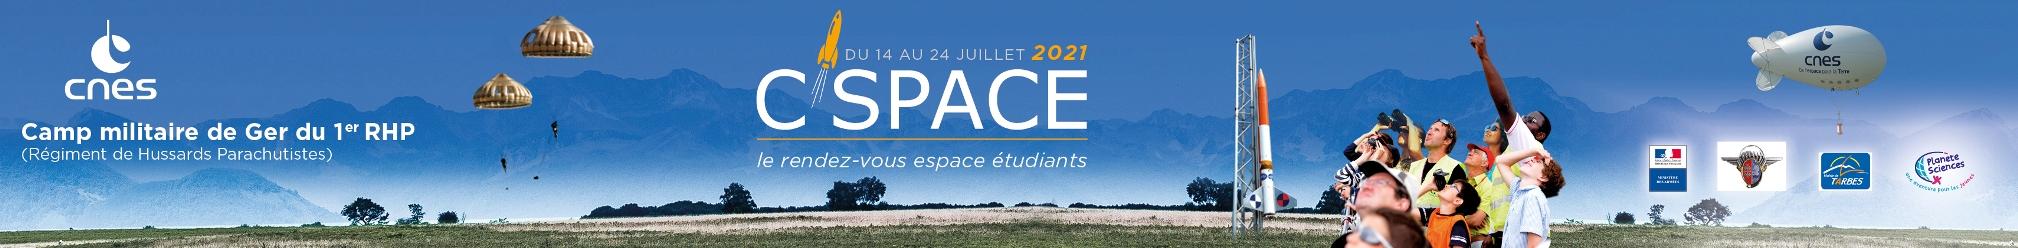 cspace2021